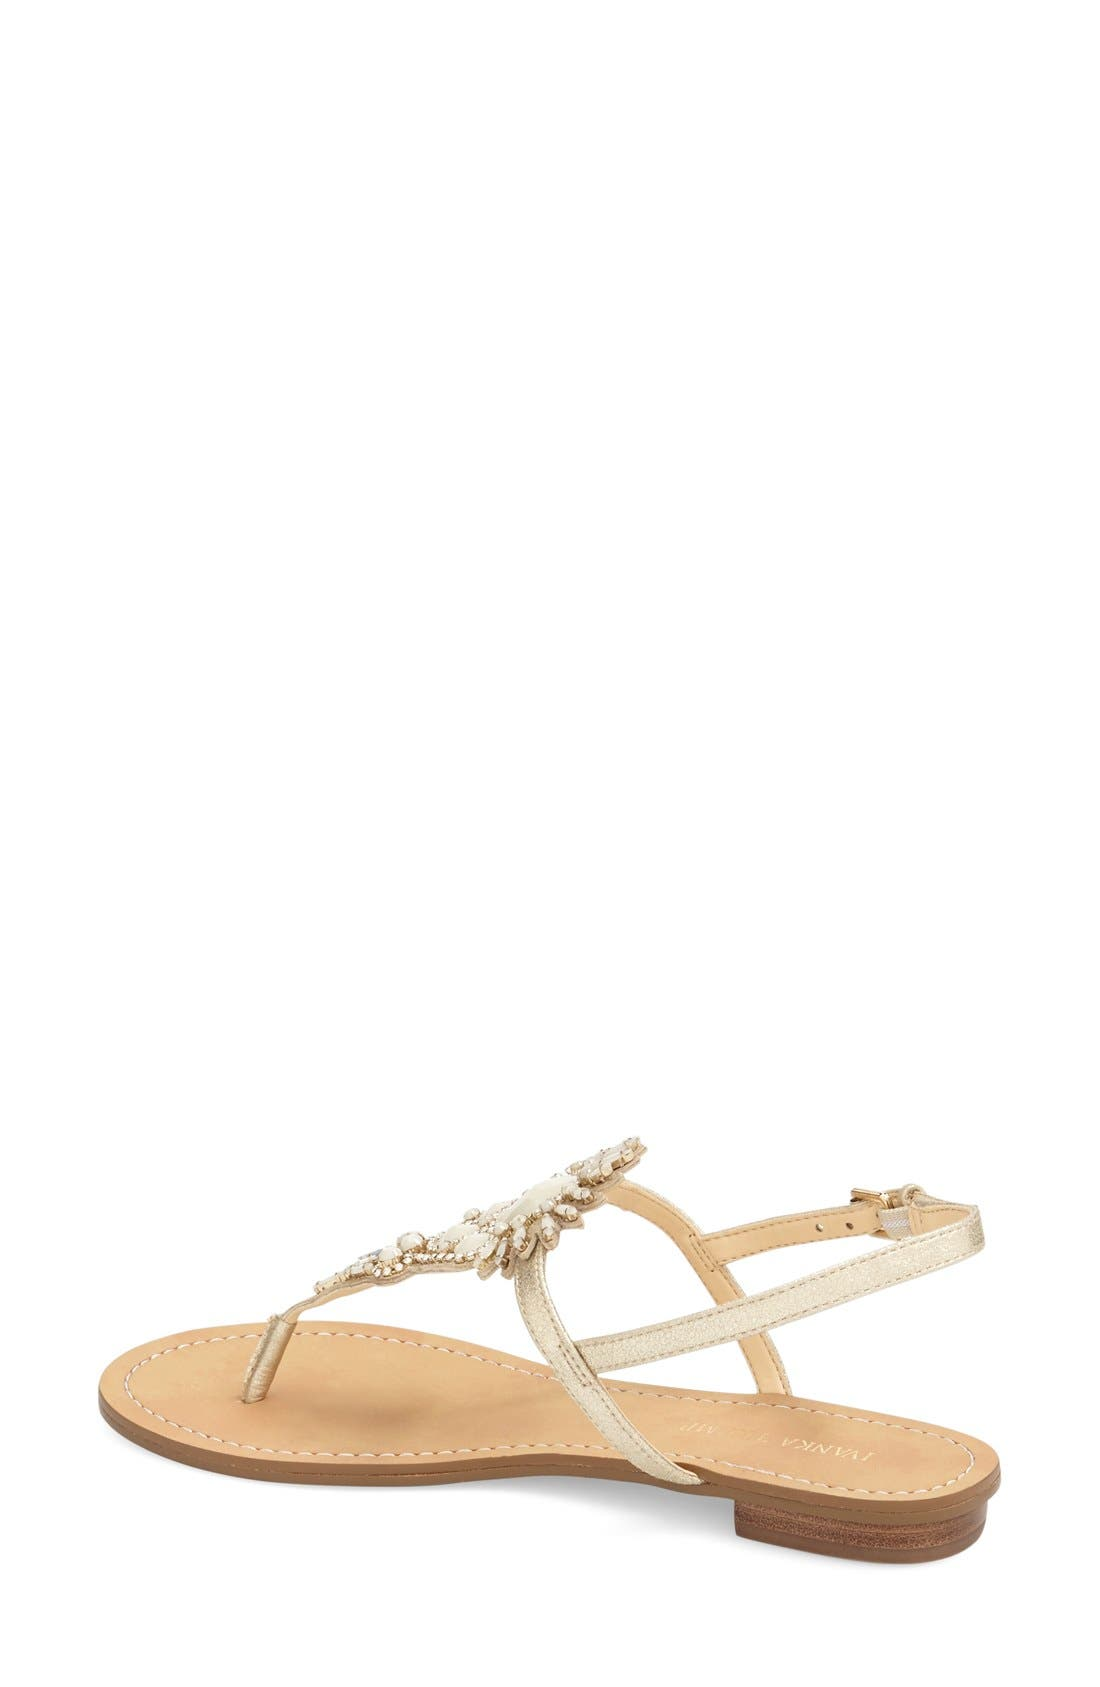 Alternate Image 2  - Ivanka Trump 'Faron' Bead Embellished Flat Sandal (Women)